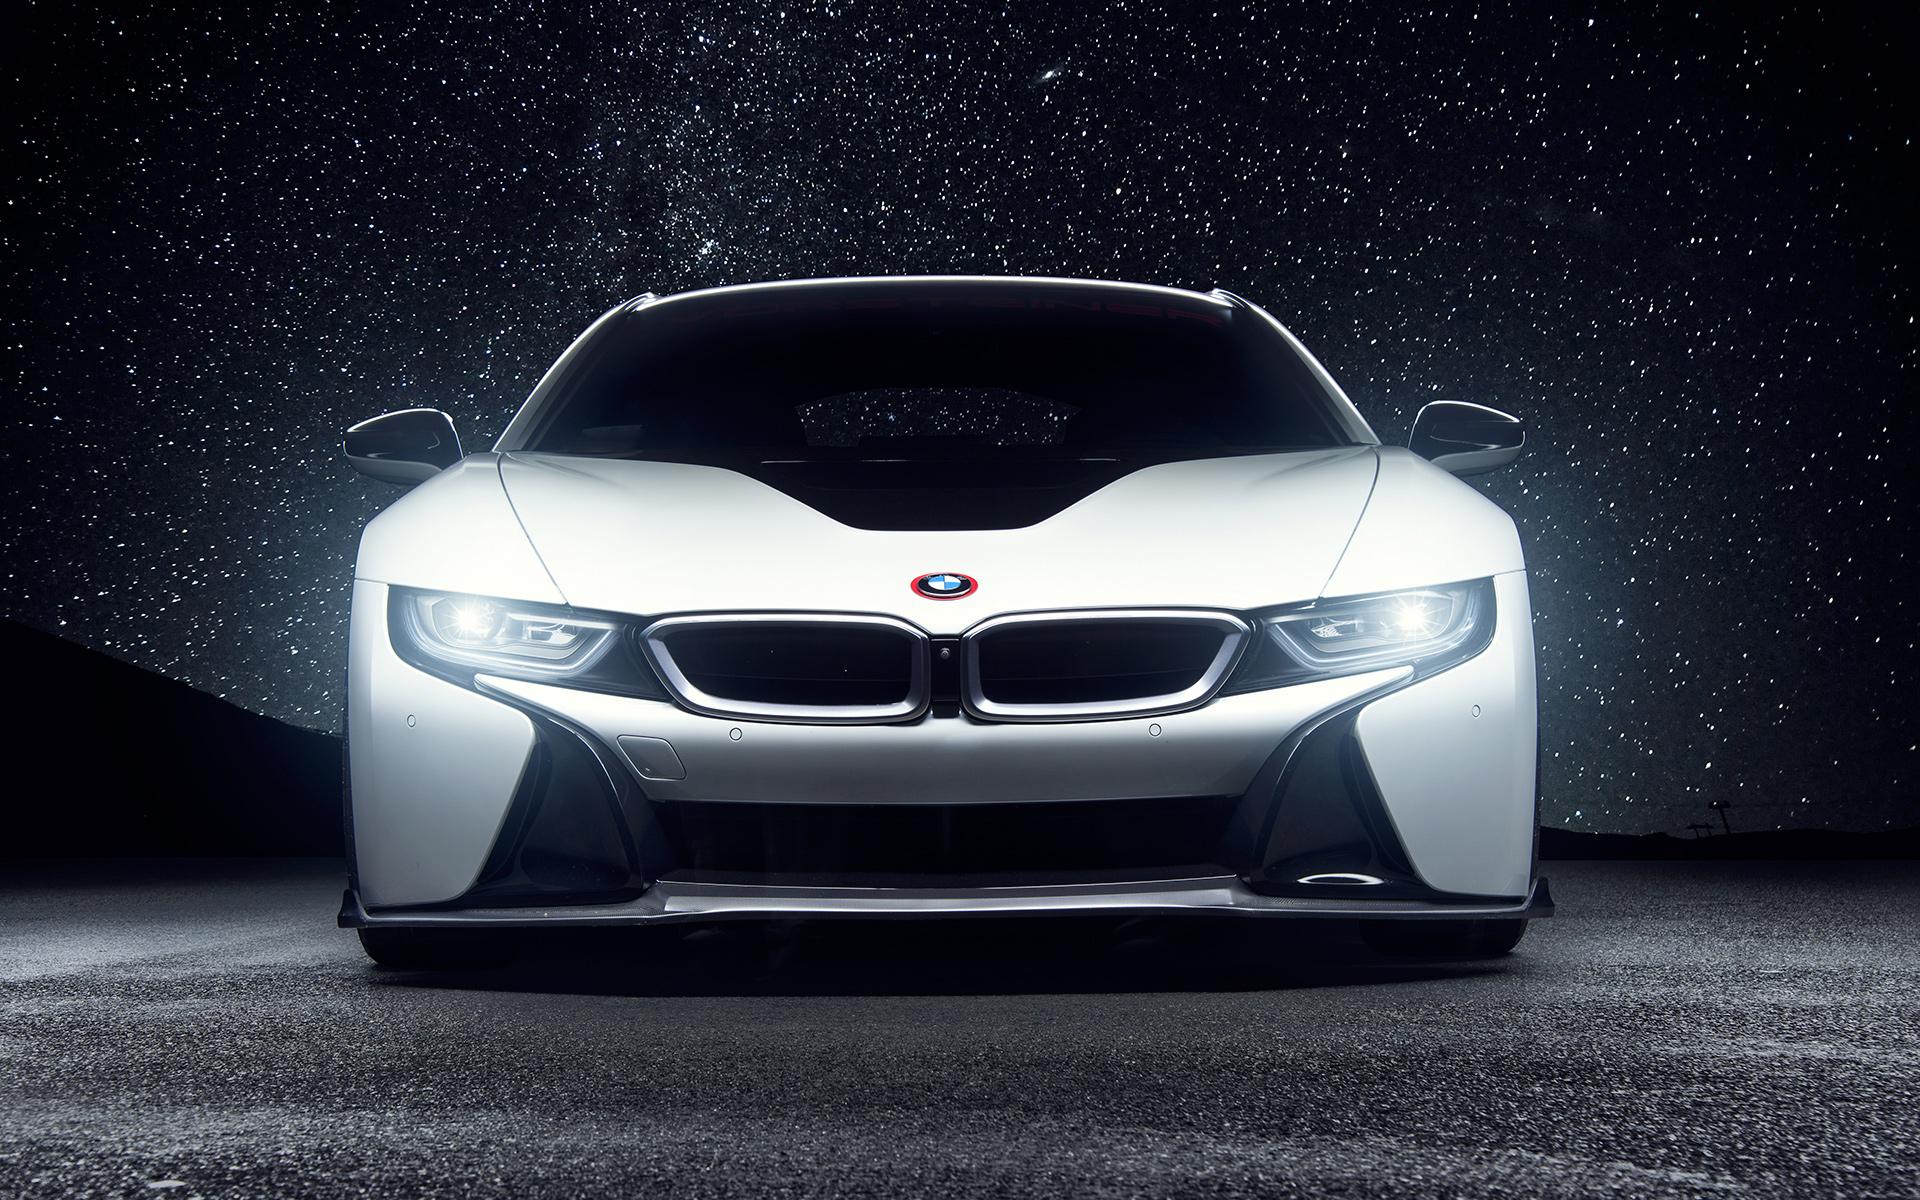 Vorsteiner BMW i8 Aero Wallpaper | HD Car Wallpapers | ID ...